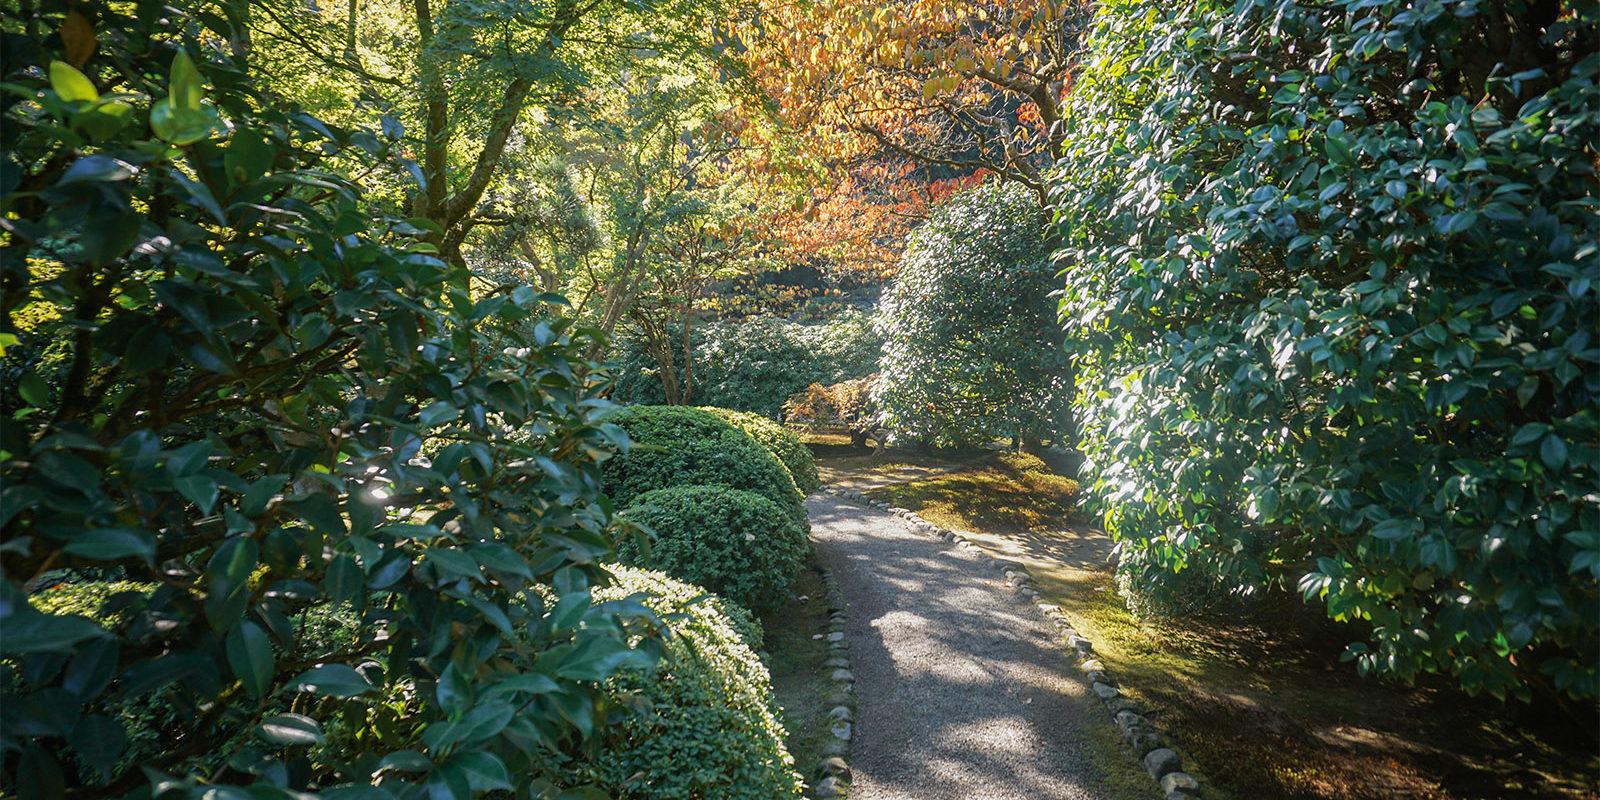 October Fall Photos of Portland Japanese Garden - 2018-10-22 - DSC01046_low